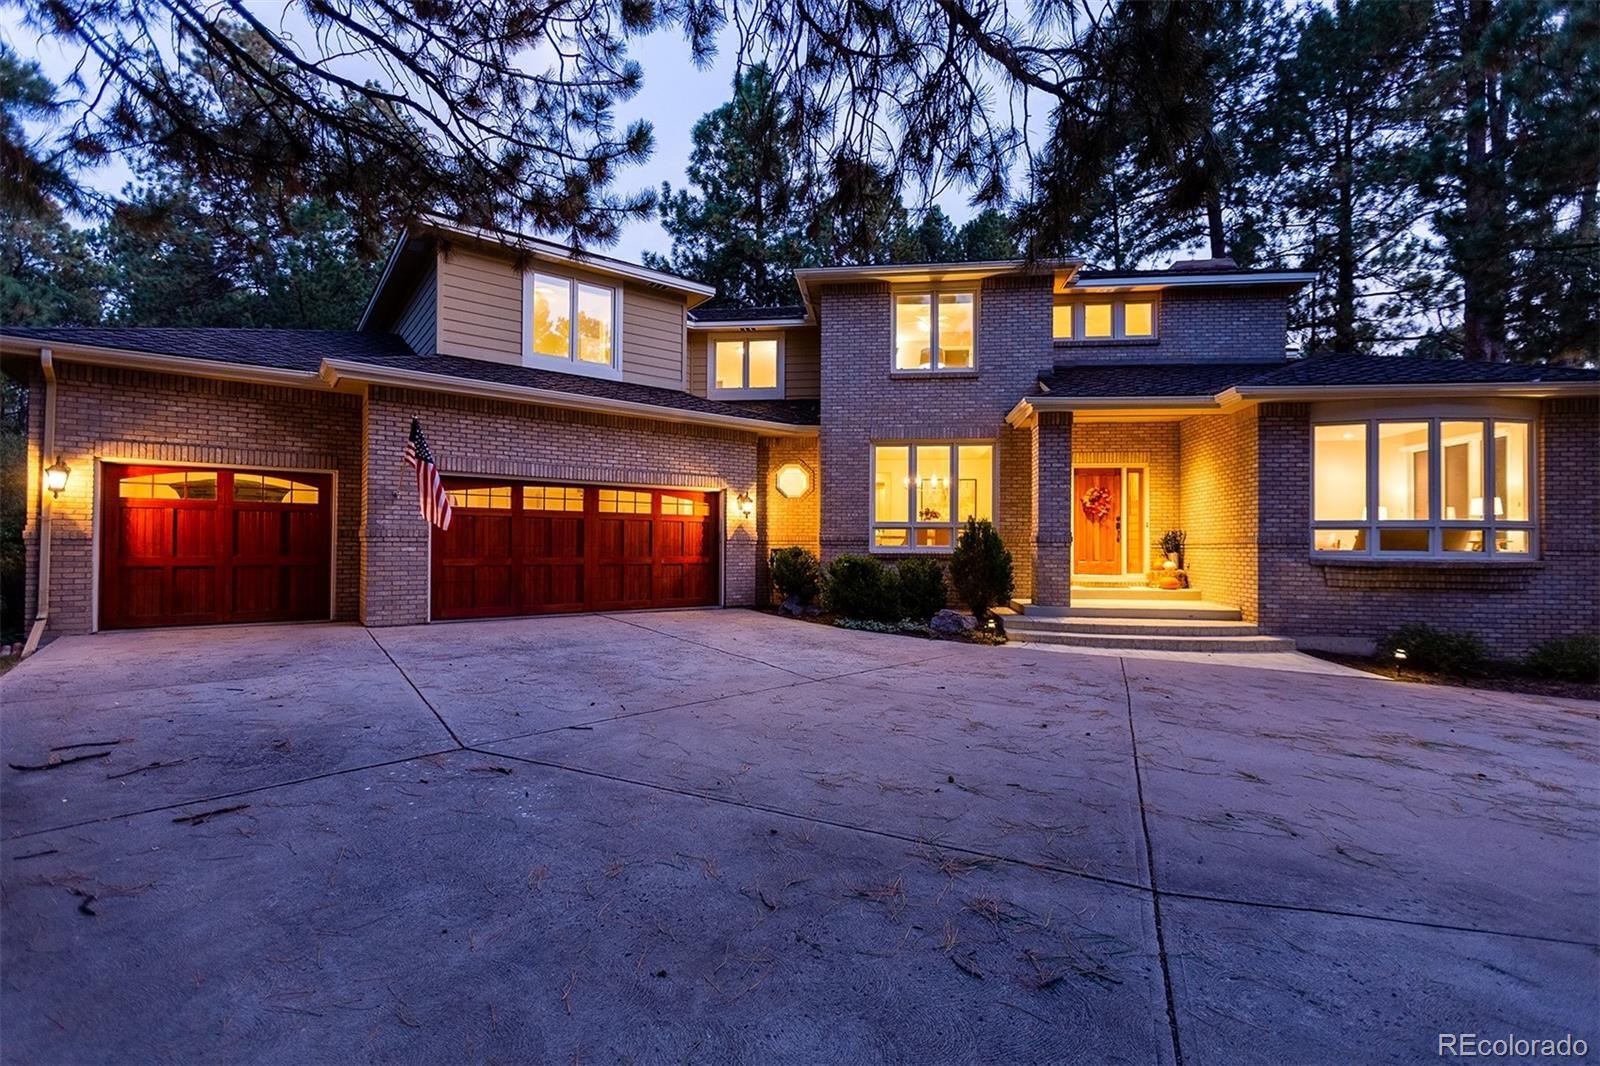 MLS# 7371899 - 1 - 429 Castle Pines Drive, Castle Rock, CO 80108